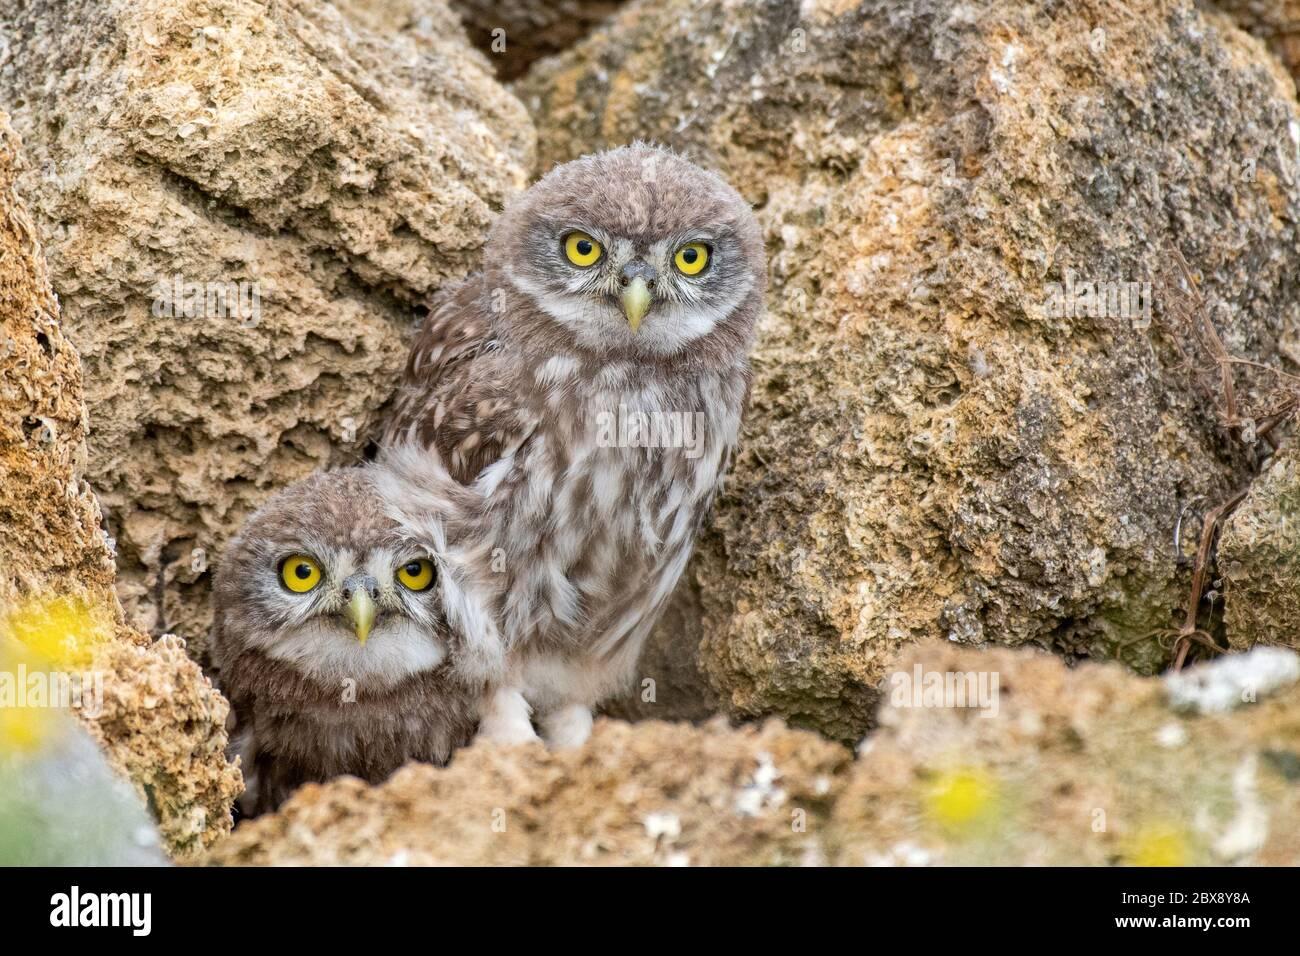 Dos pequeñas lechuzas, Athene noctua, sacando un ojo de un agujero en las rocas. Foto de stock